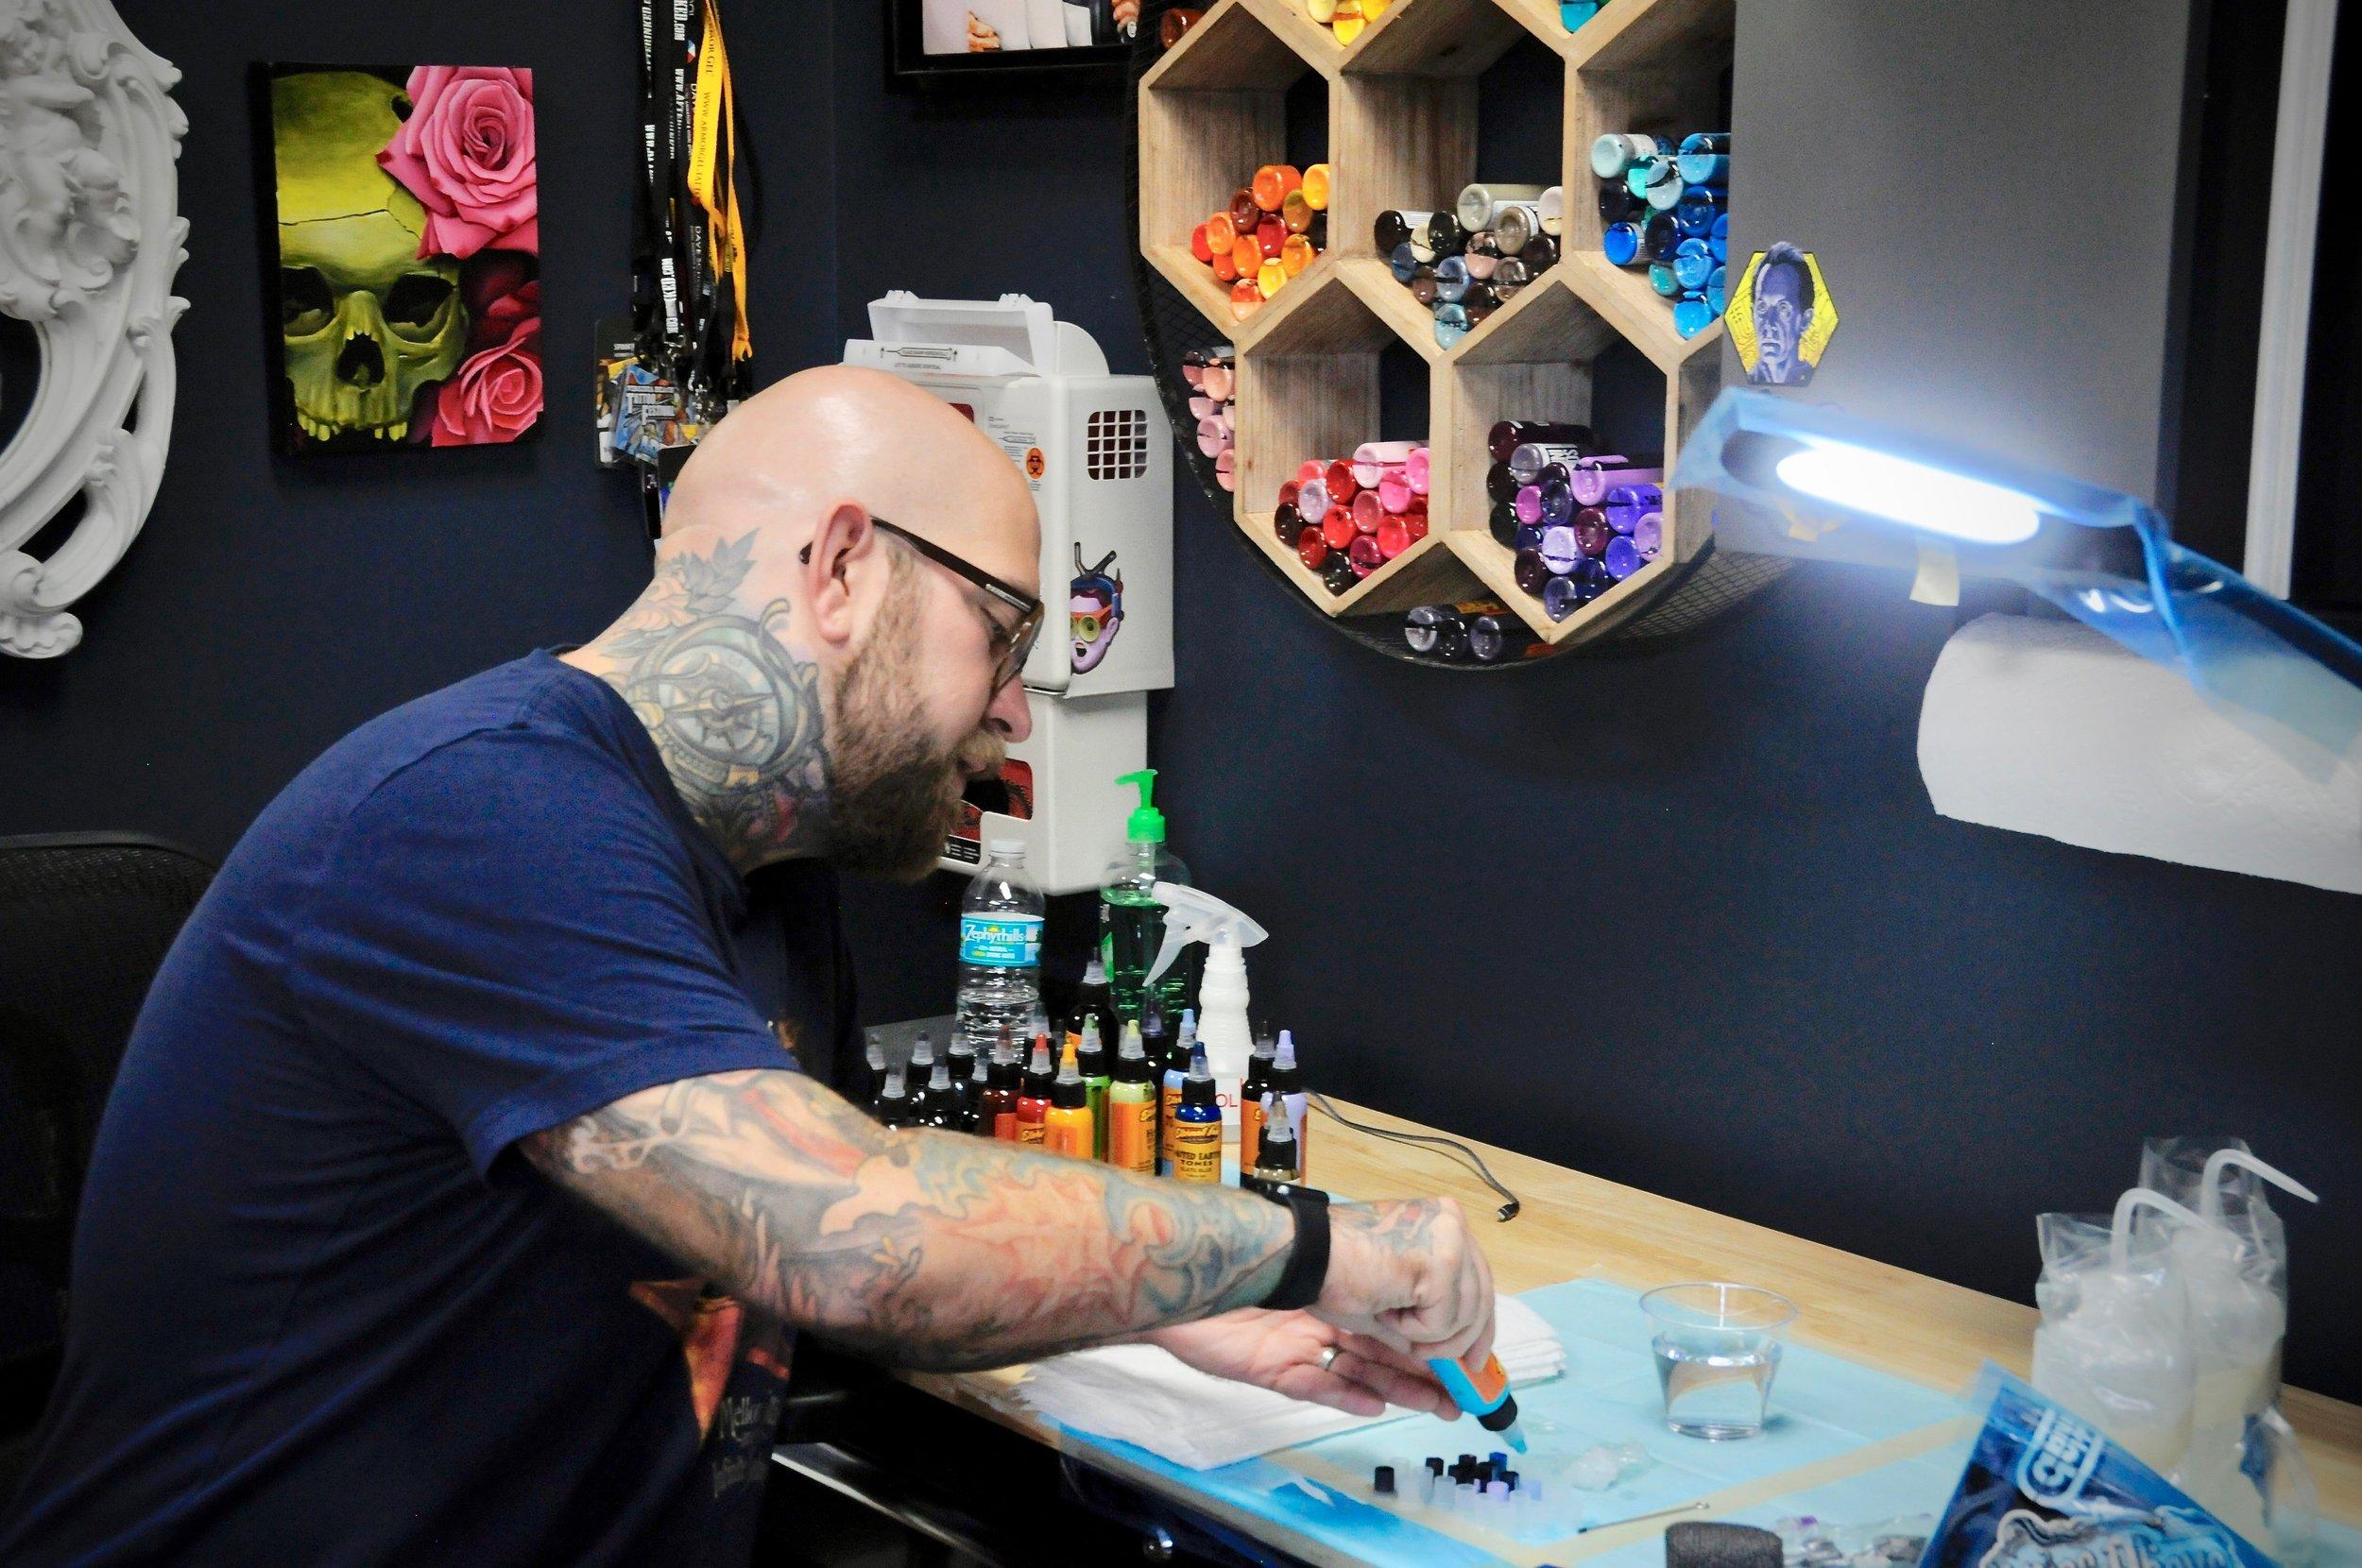 the-east-tattoo---salon-design_44627907652_o.jpg